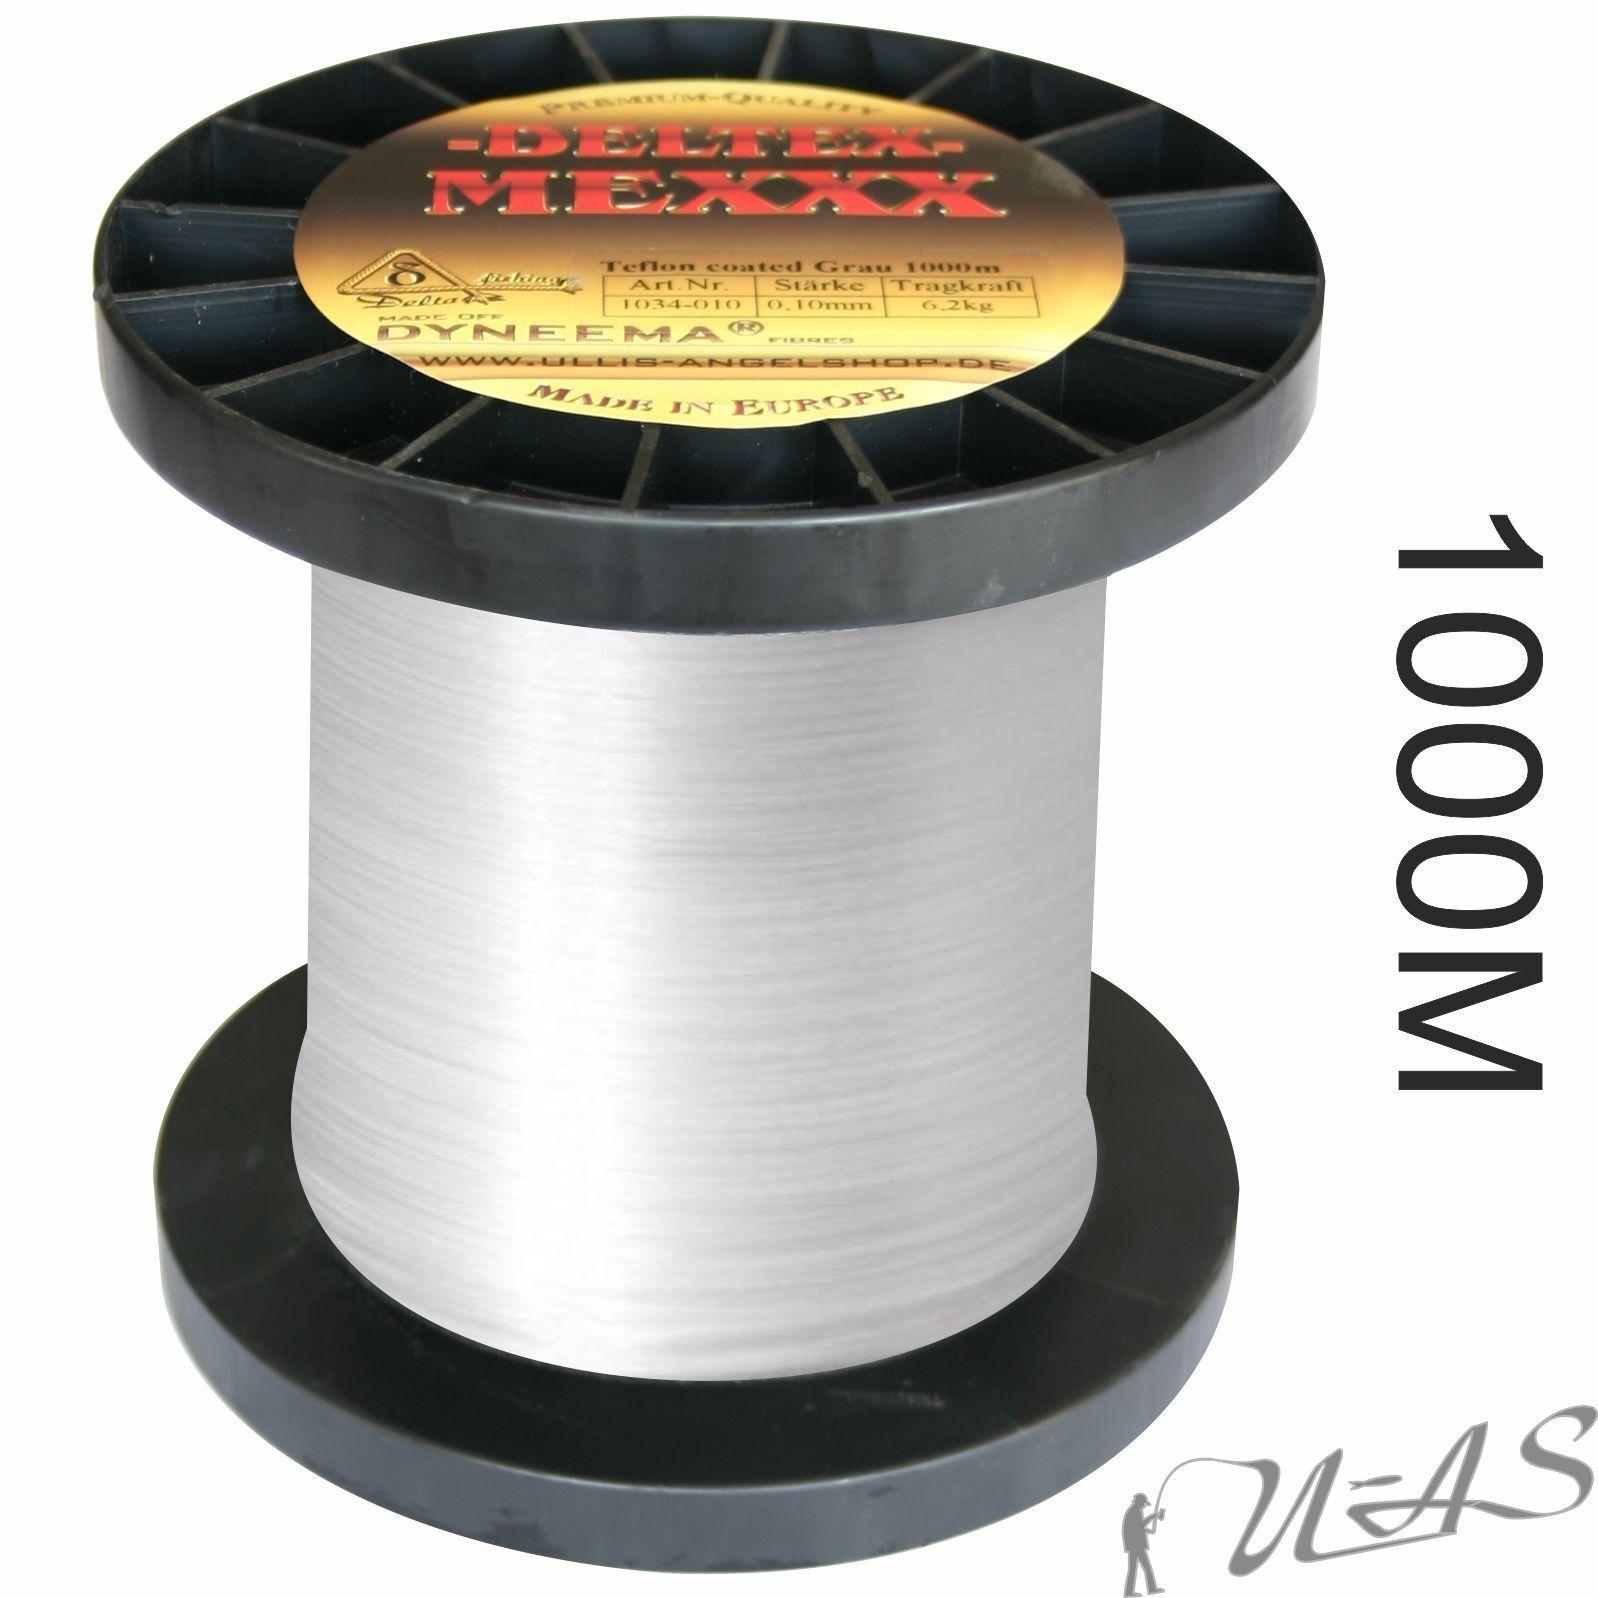 Deltex mexxx BIANCO 1000m Dyneema intrecciato lenza Teflon coated SHA